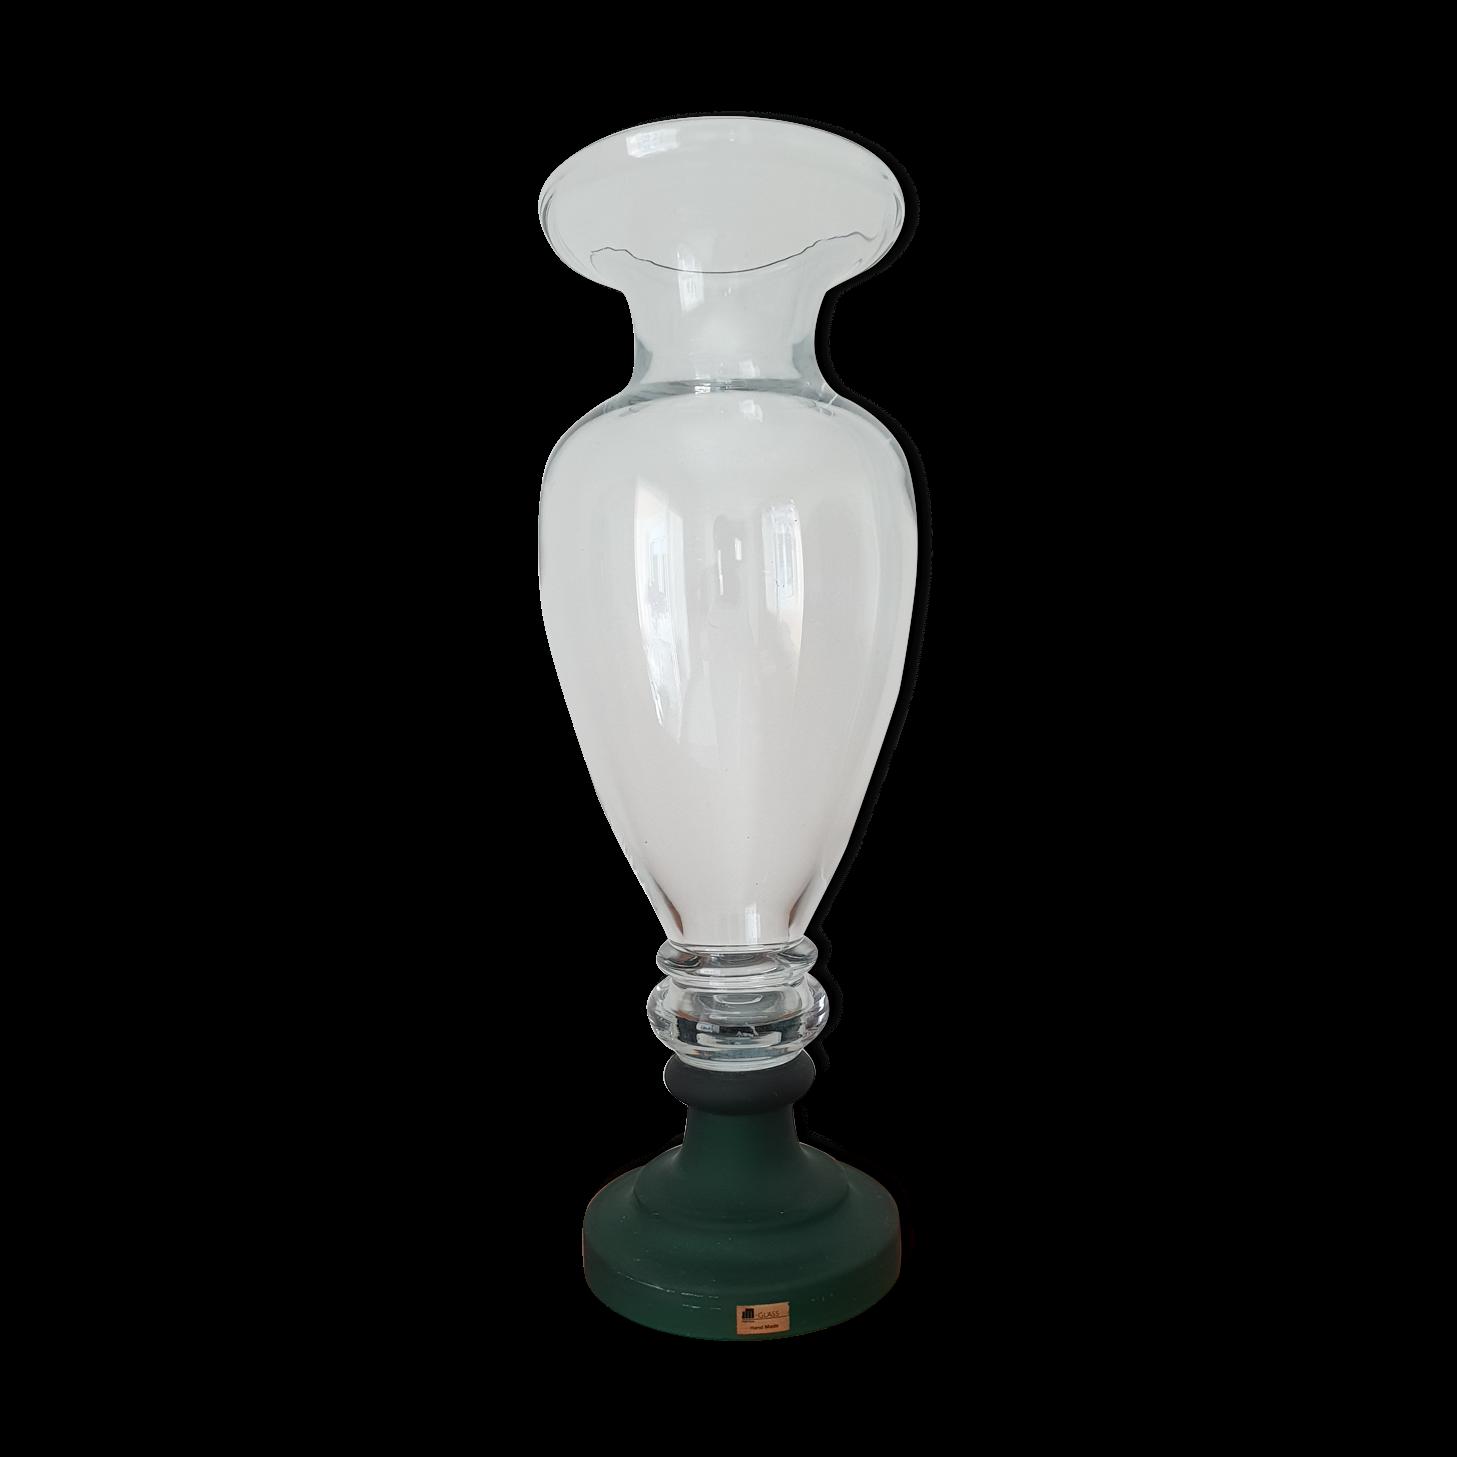 vase grande taille Vase ballustre grande taille verre JM Portugal - verre et cristal -  transparent - classique - HumCeOj